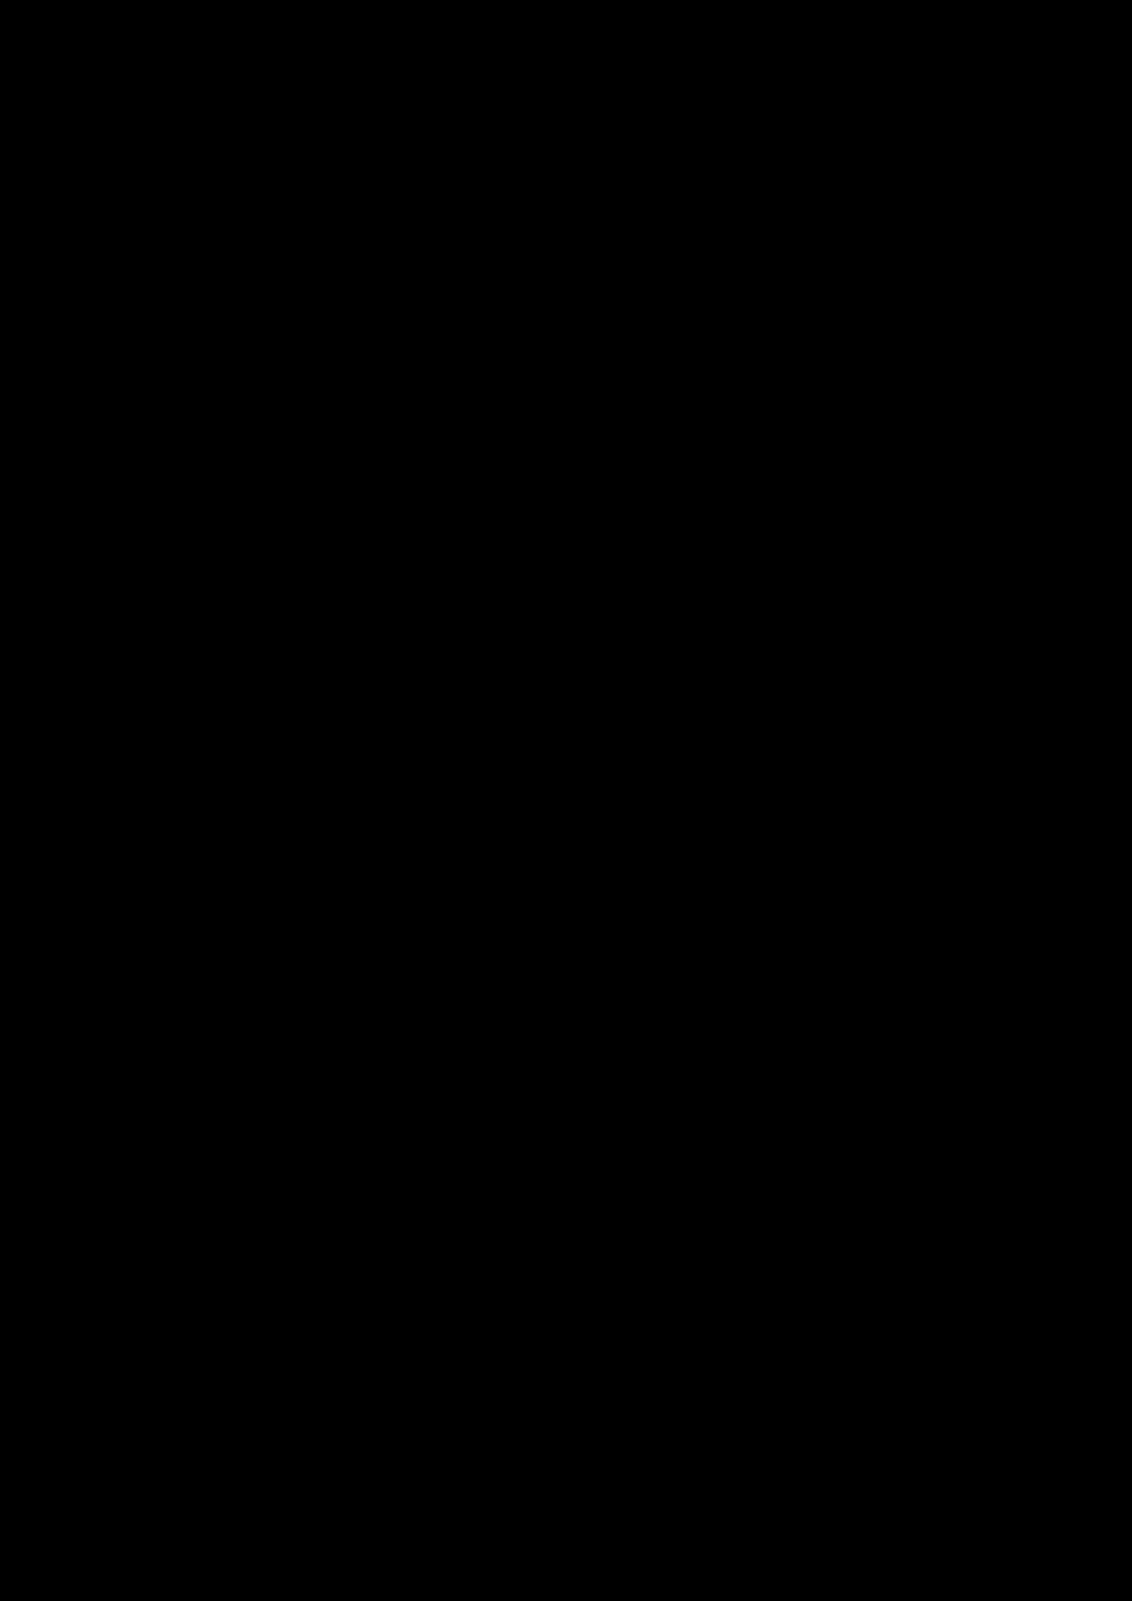 Ispoved Pervogo Boga slide, Image 6